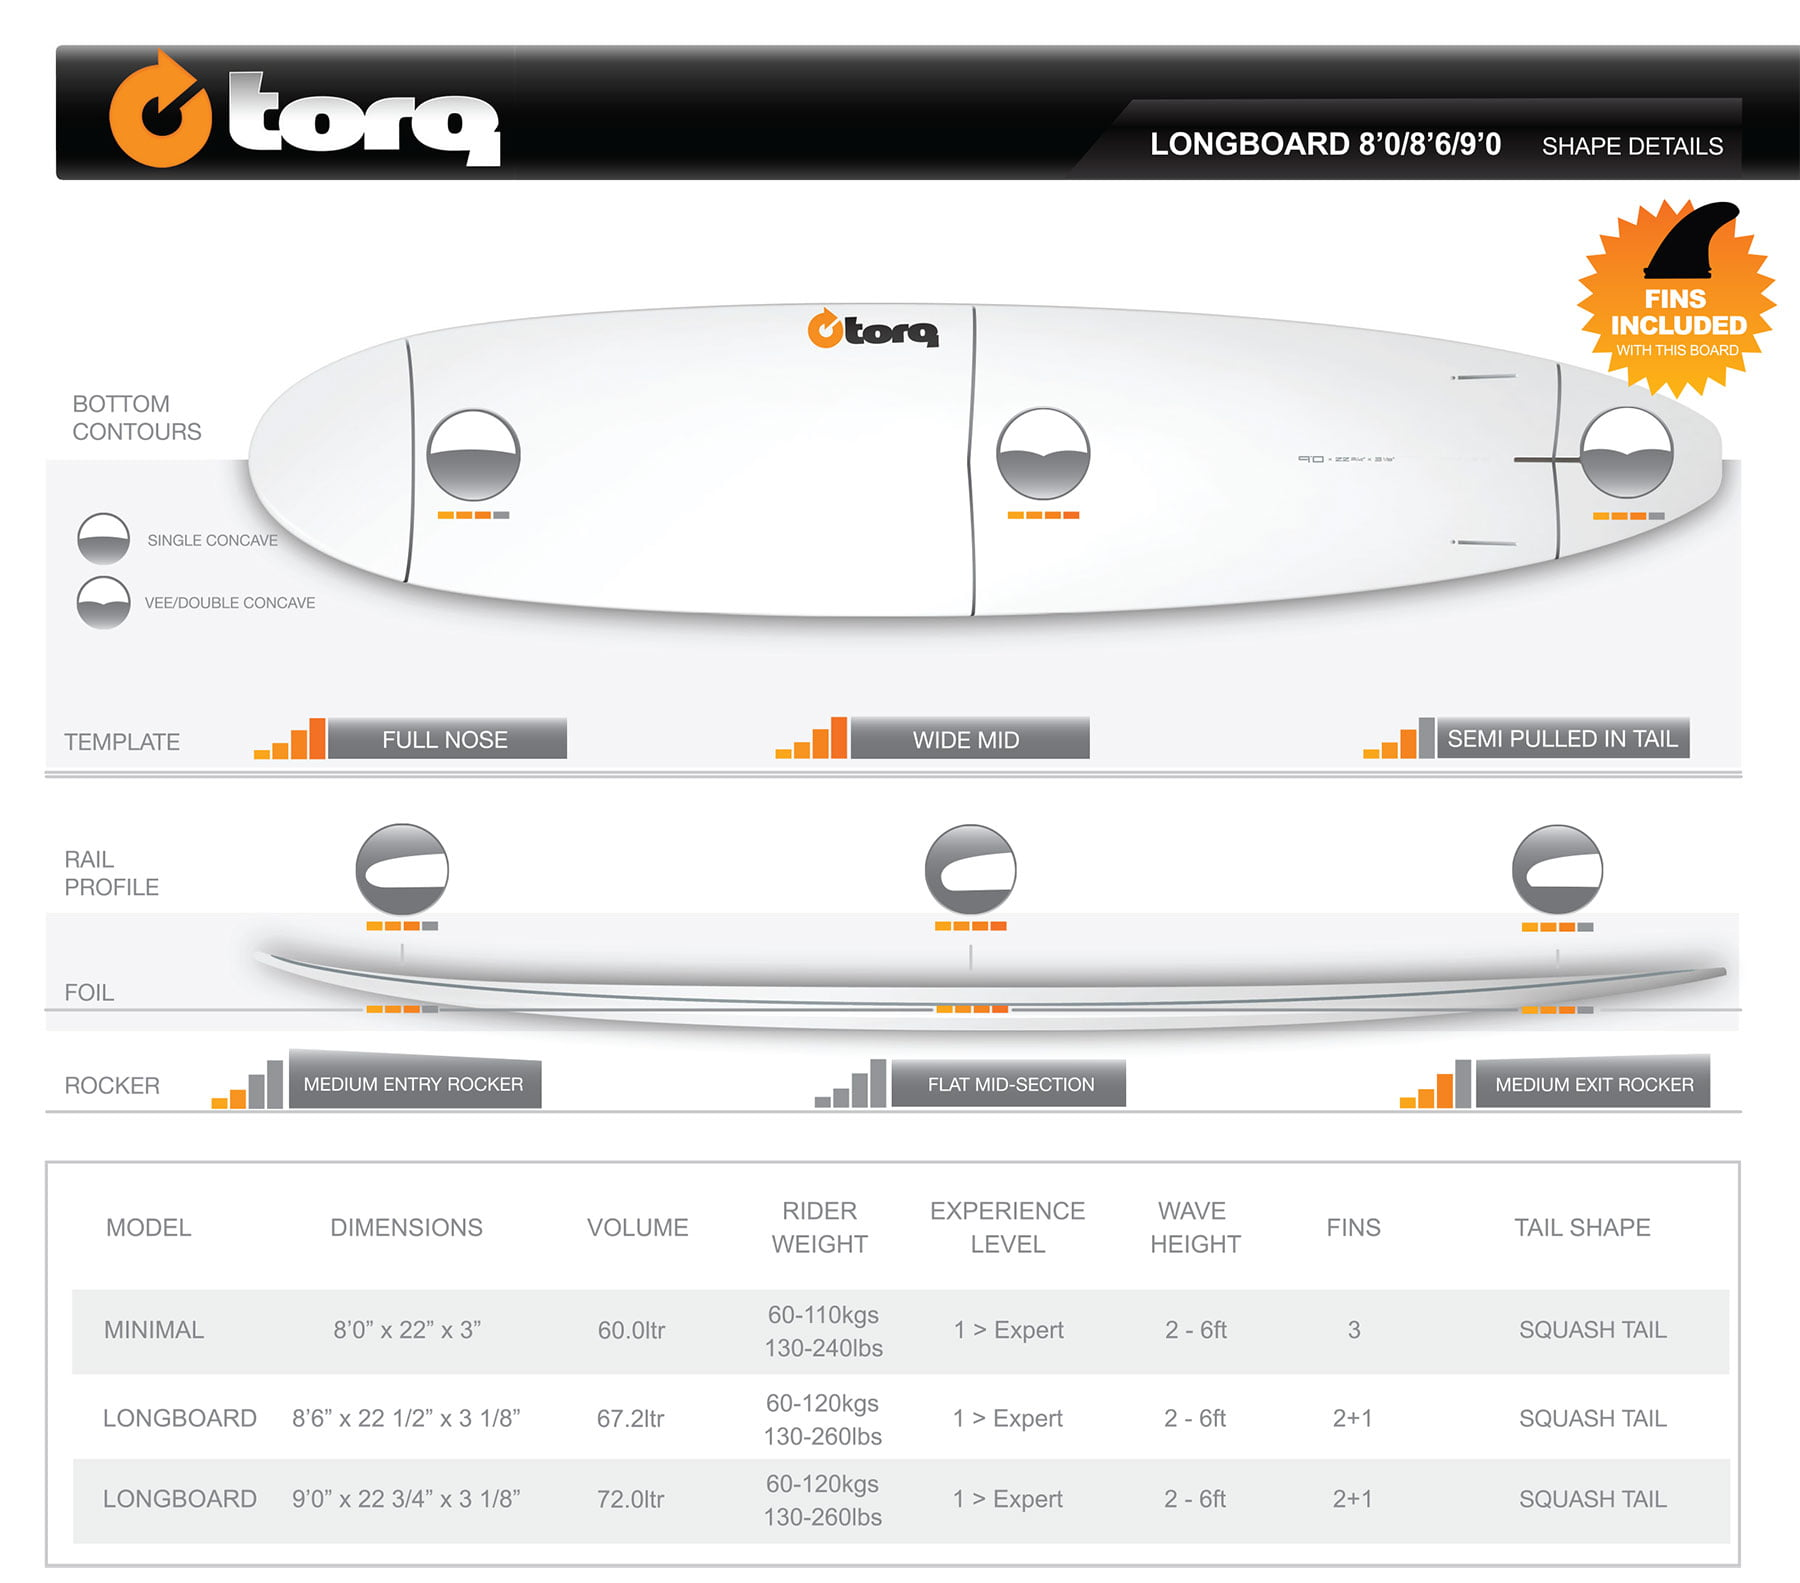 TORQ_6-LONGBOARD-SHAPE-DETAILS